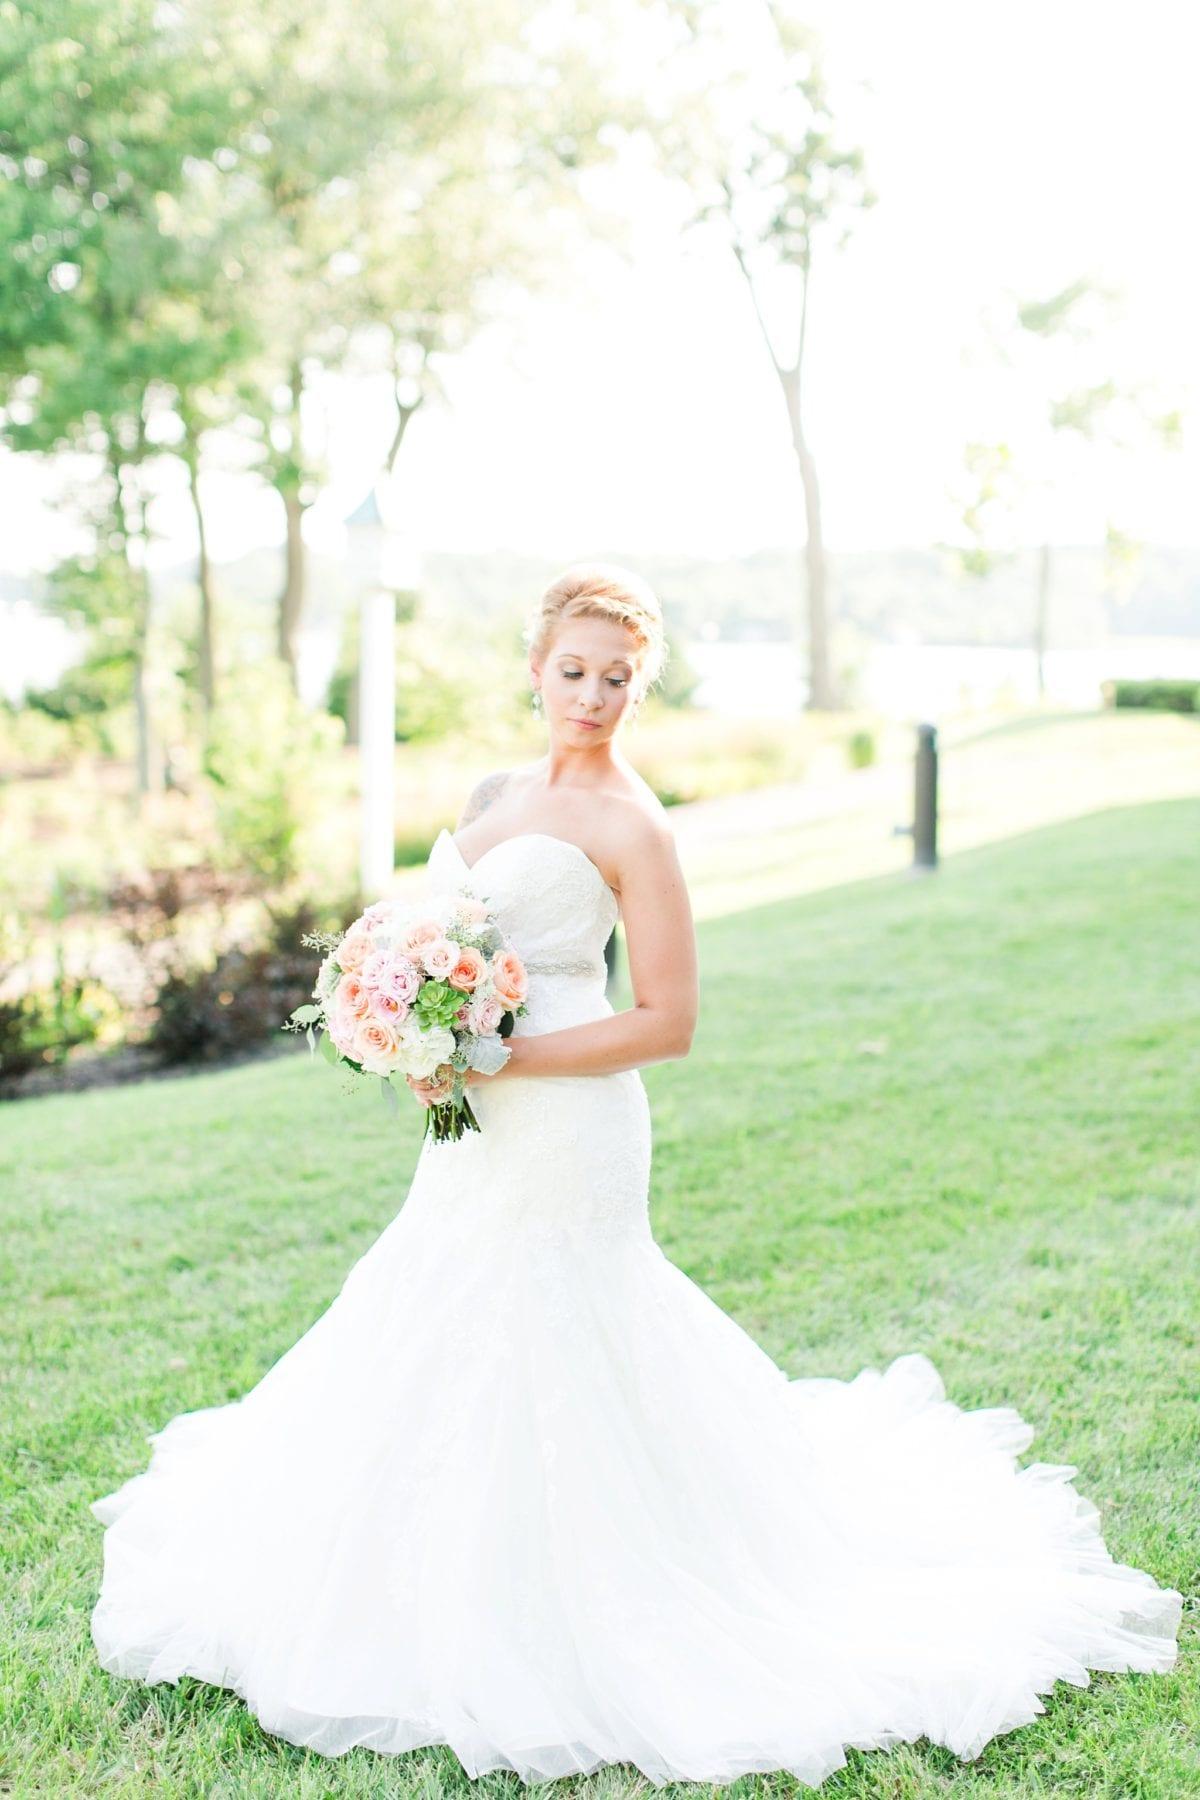 Waters Edge Wedding Photos Maryland Wedding Photographer Megan Kelsey Photography Katie & Conor-416.JPG